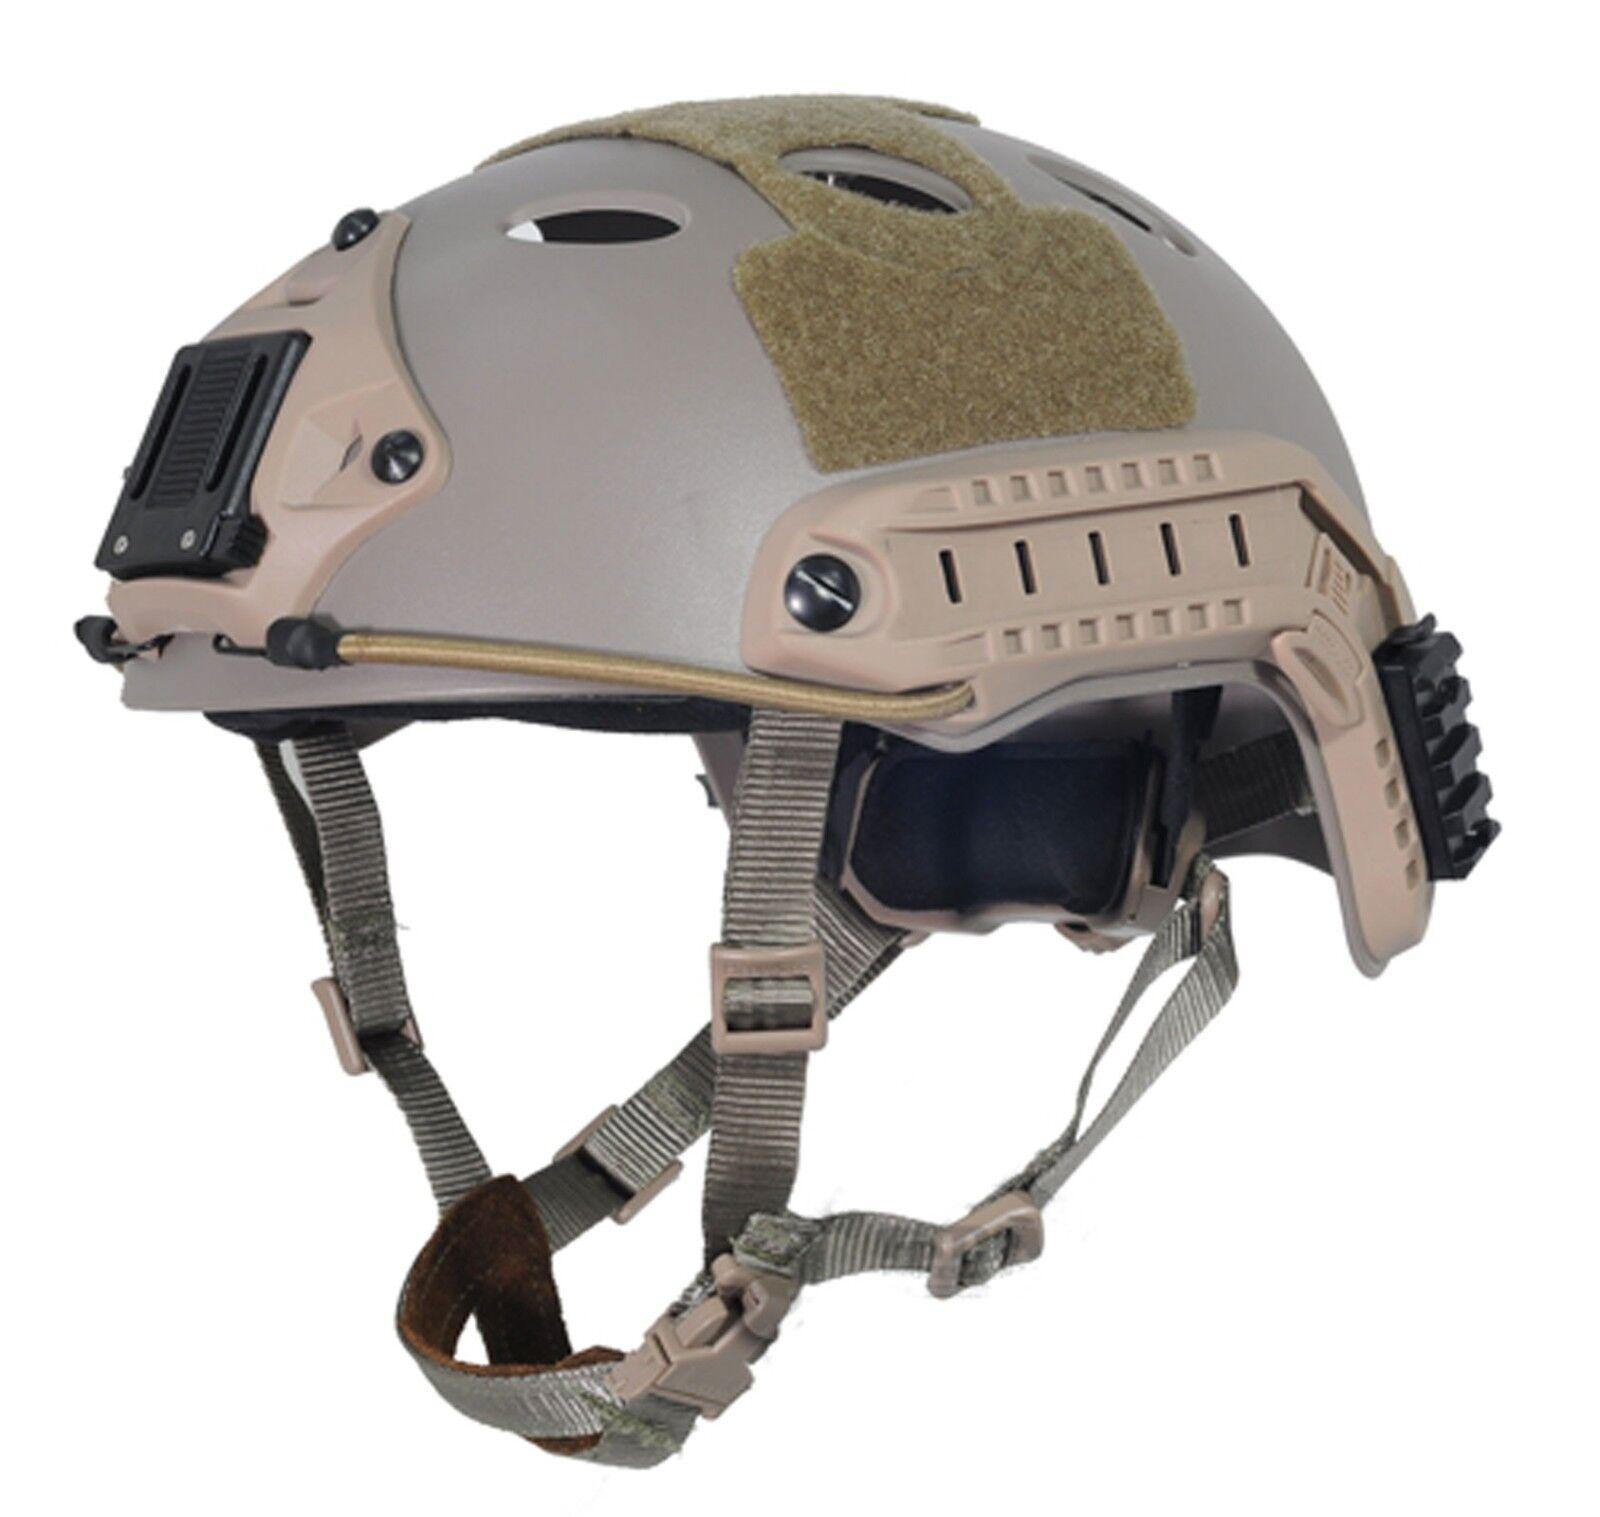 Military Tactical Airsoft Paintball FMA FAST Helmet-PJ DE T819 M L